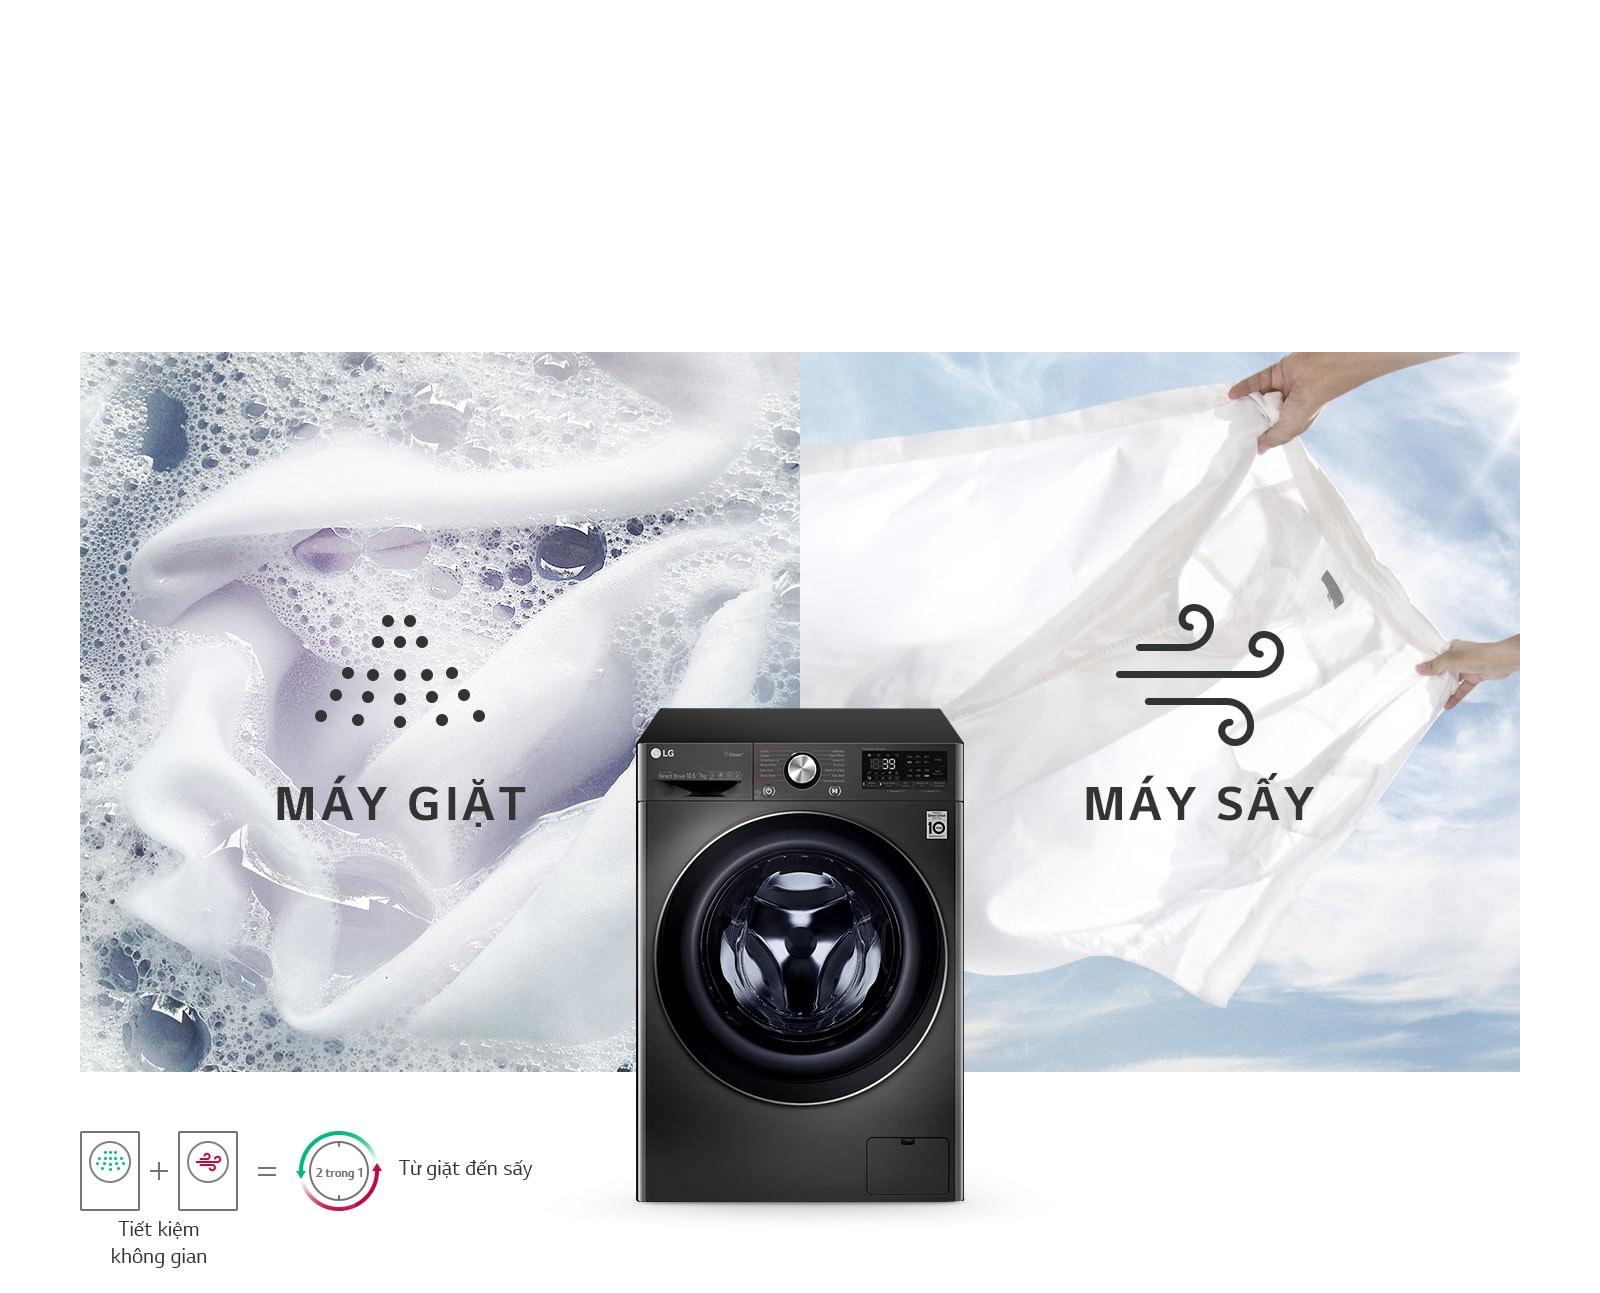 Máy Giặt & Sấy Tích Hợp Trong Một1